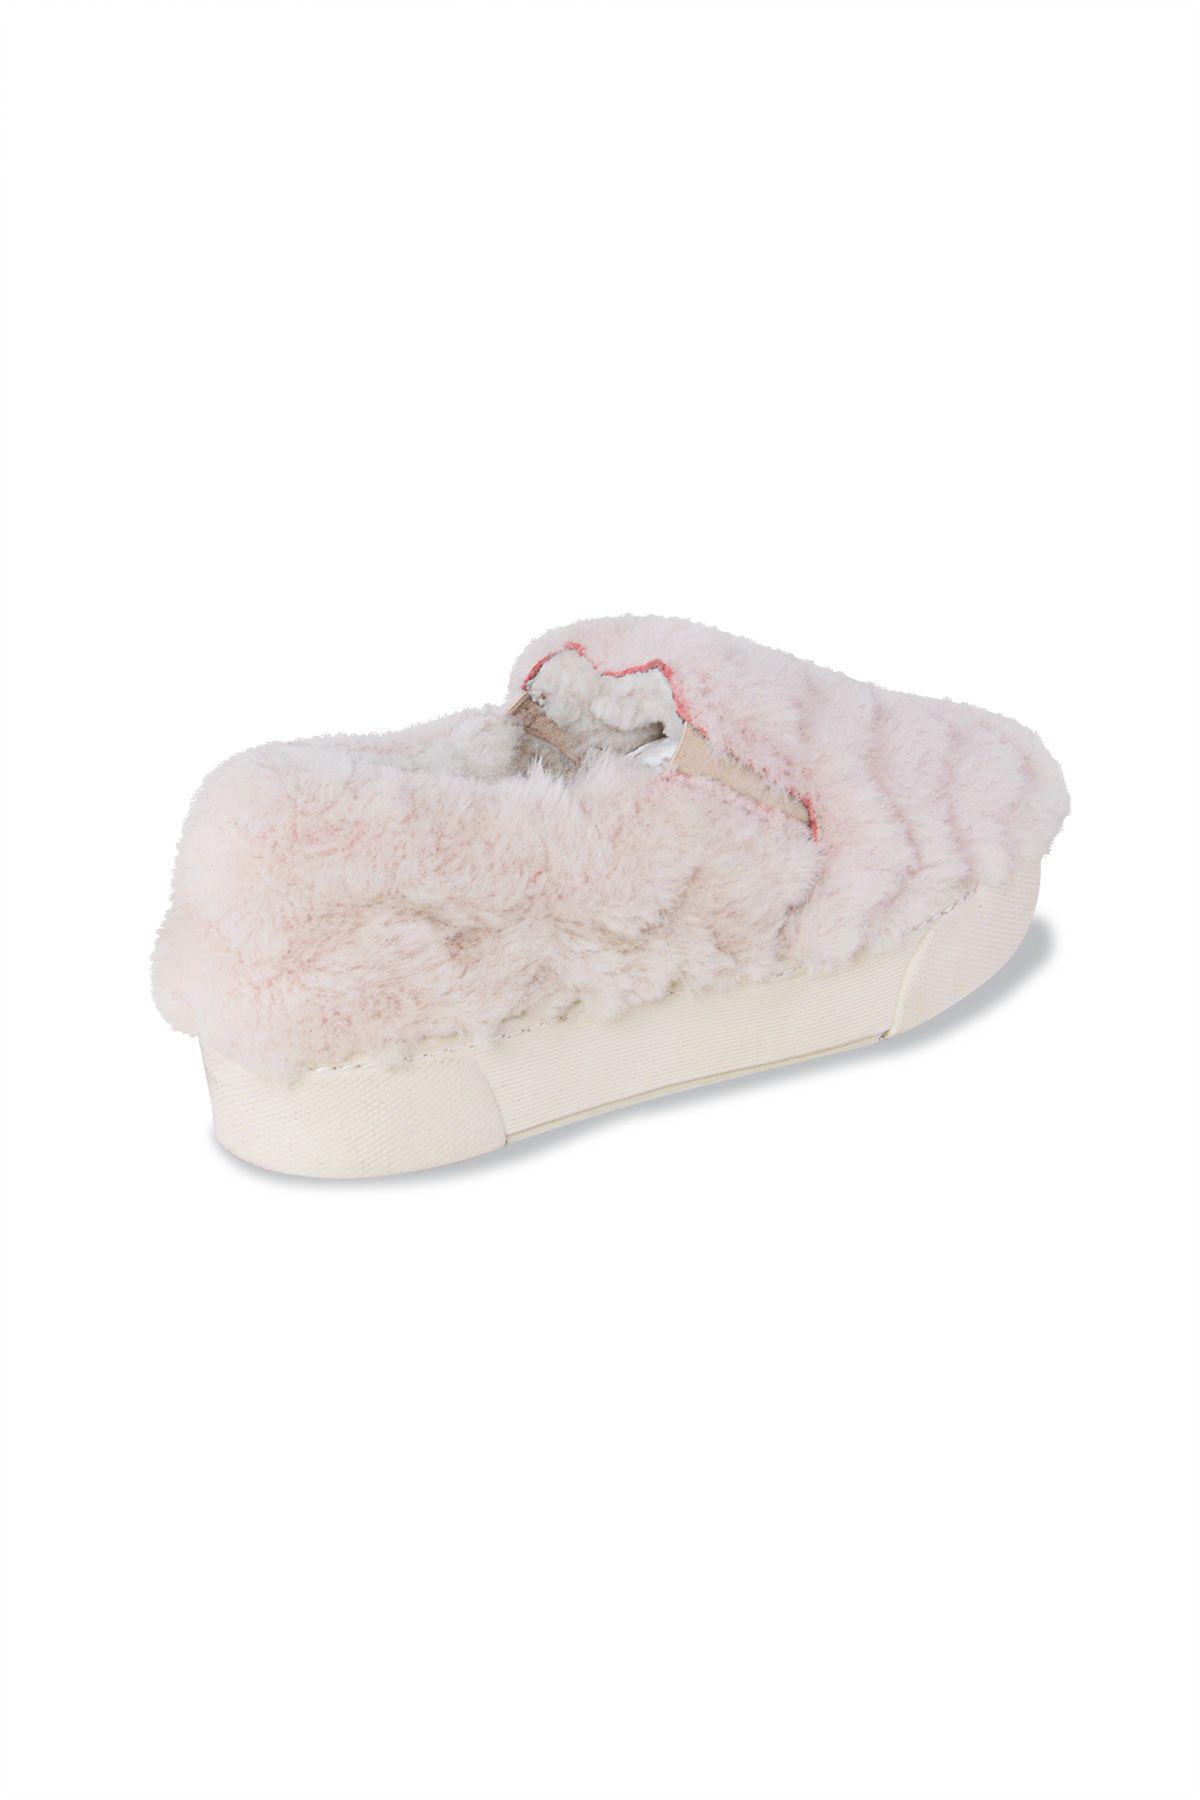 Pegia Hakiki Kürklü Bayan Sneaker 659524 Pudra